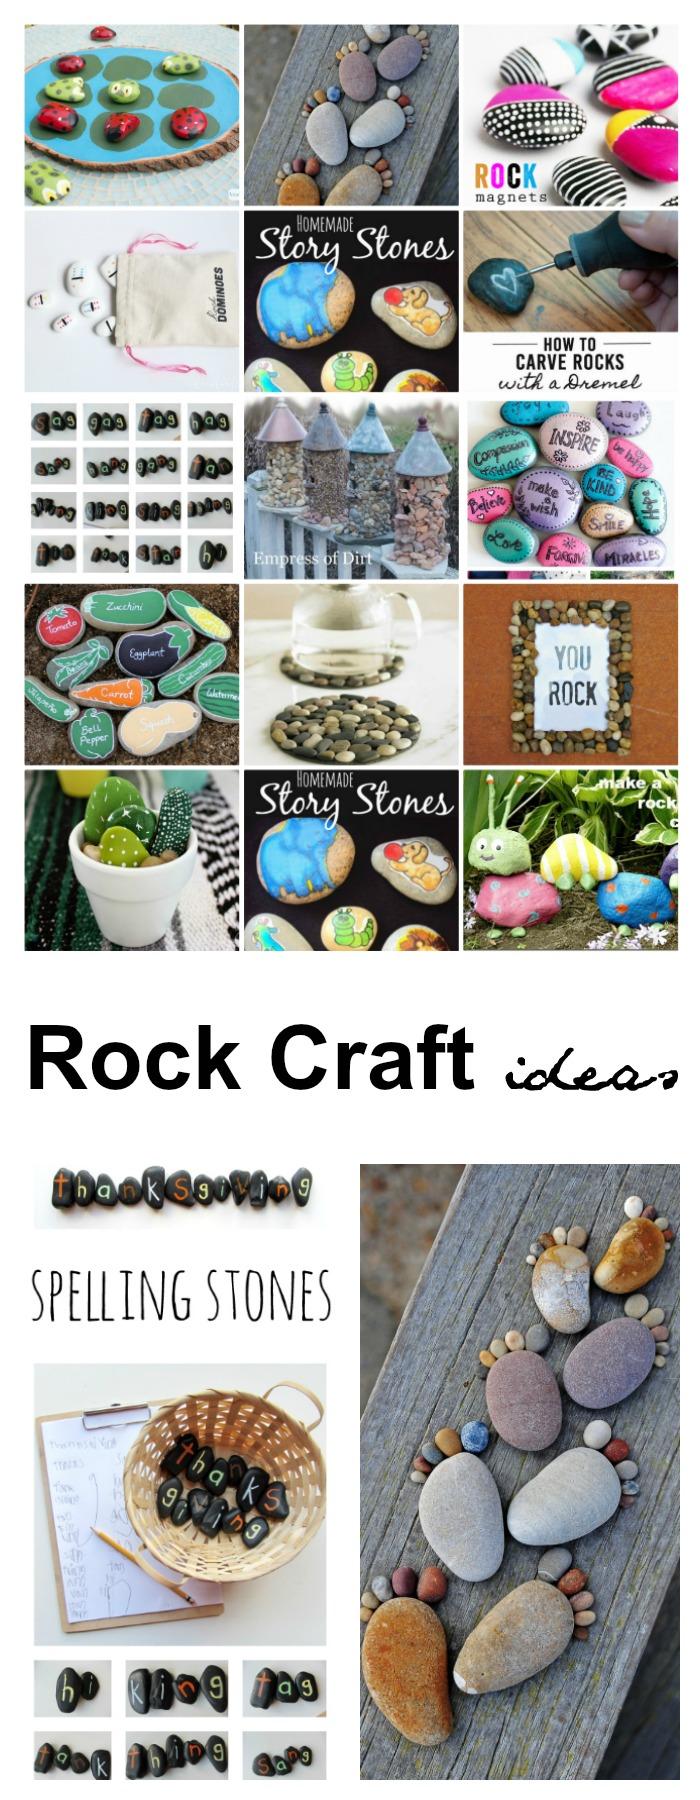 Rock-Craft-Ideas-Pin